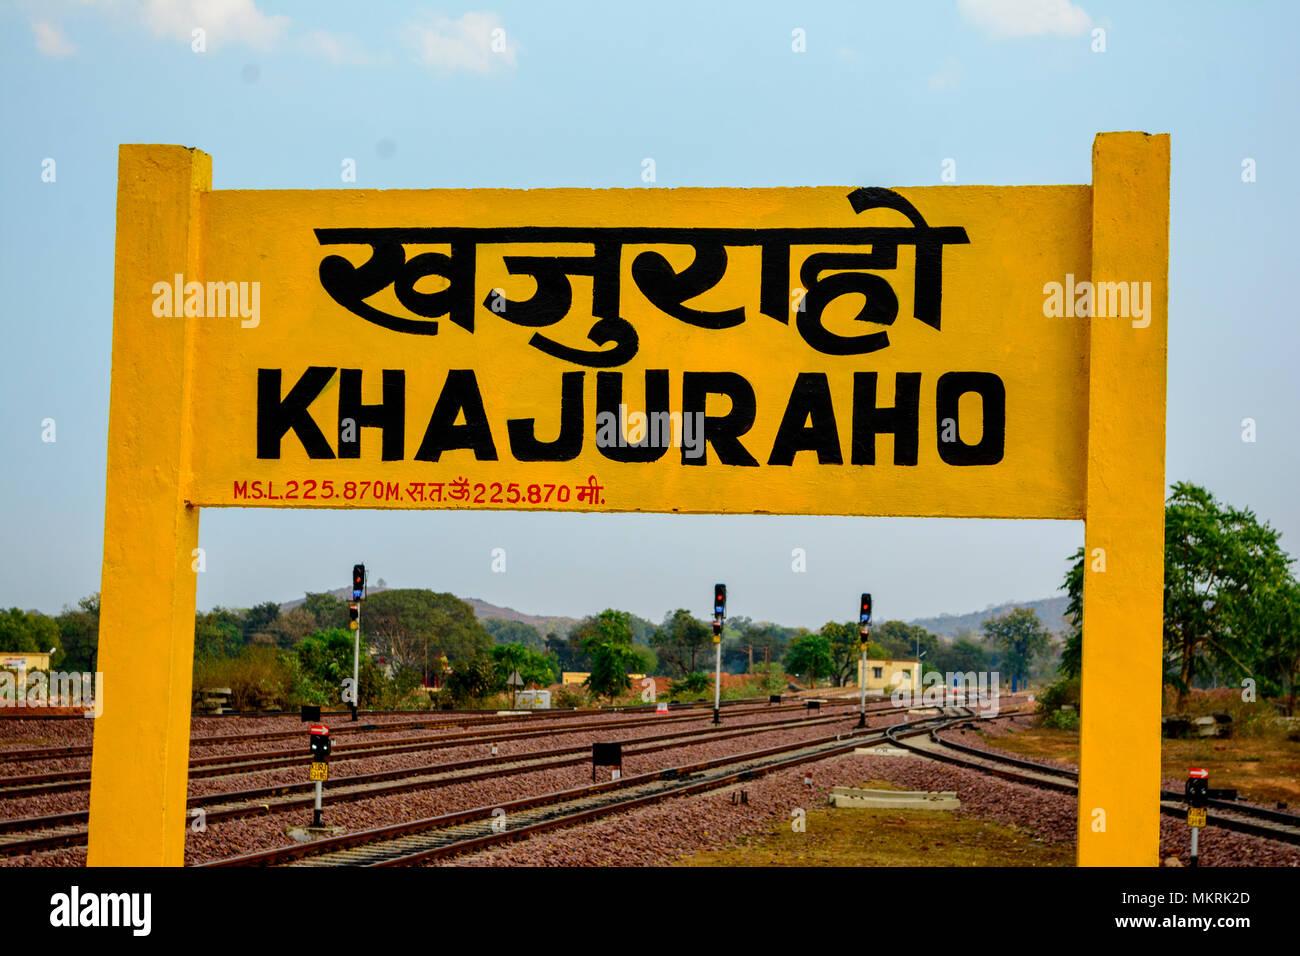 Khajuraho Sign board Madhyapradesh, India - Stock Image